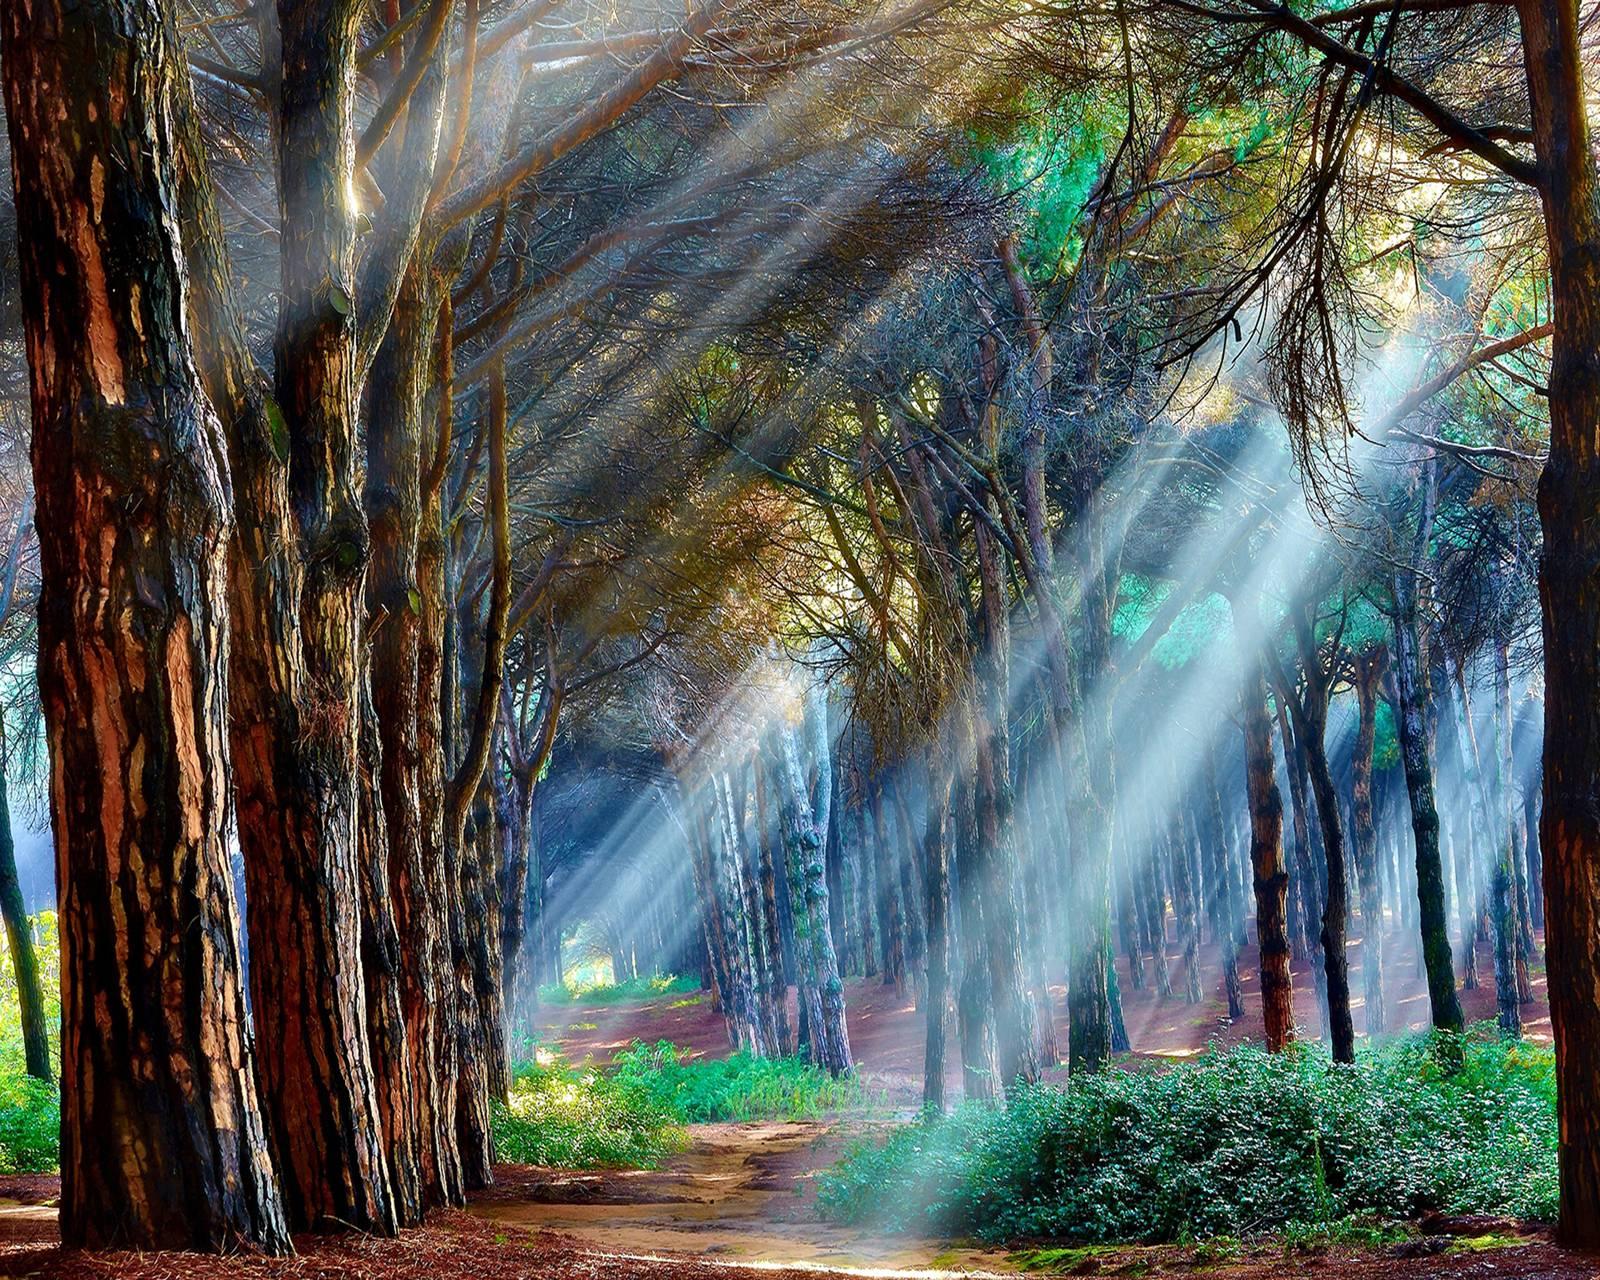 Amazing sunlight